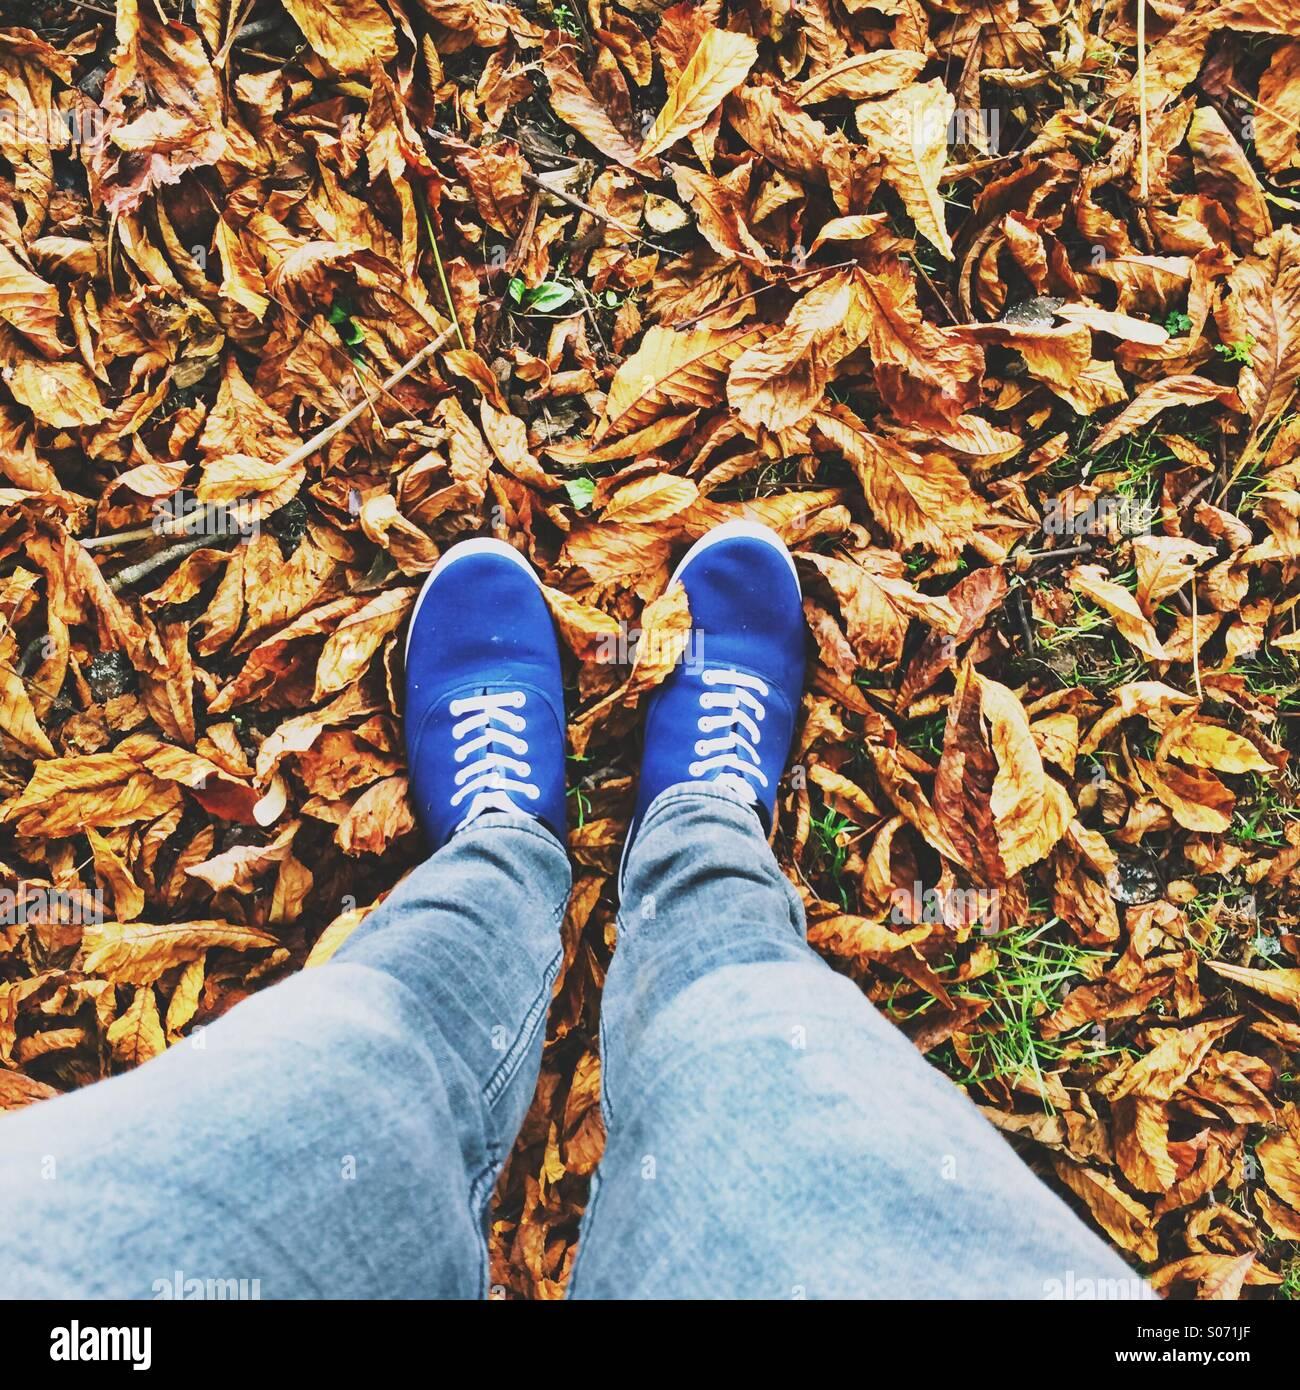 Walking feet on fallen autumn leaves - Stock Image